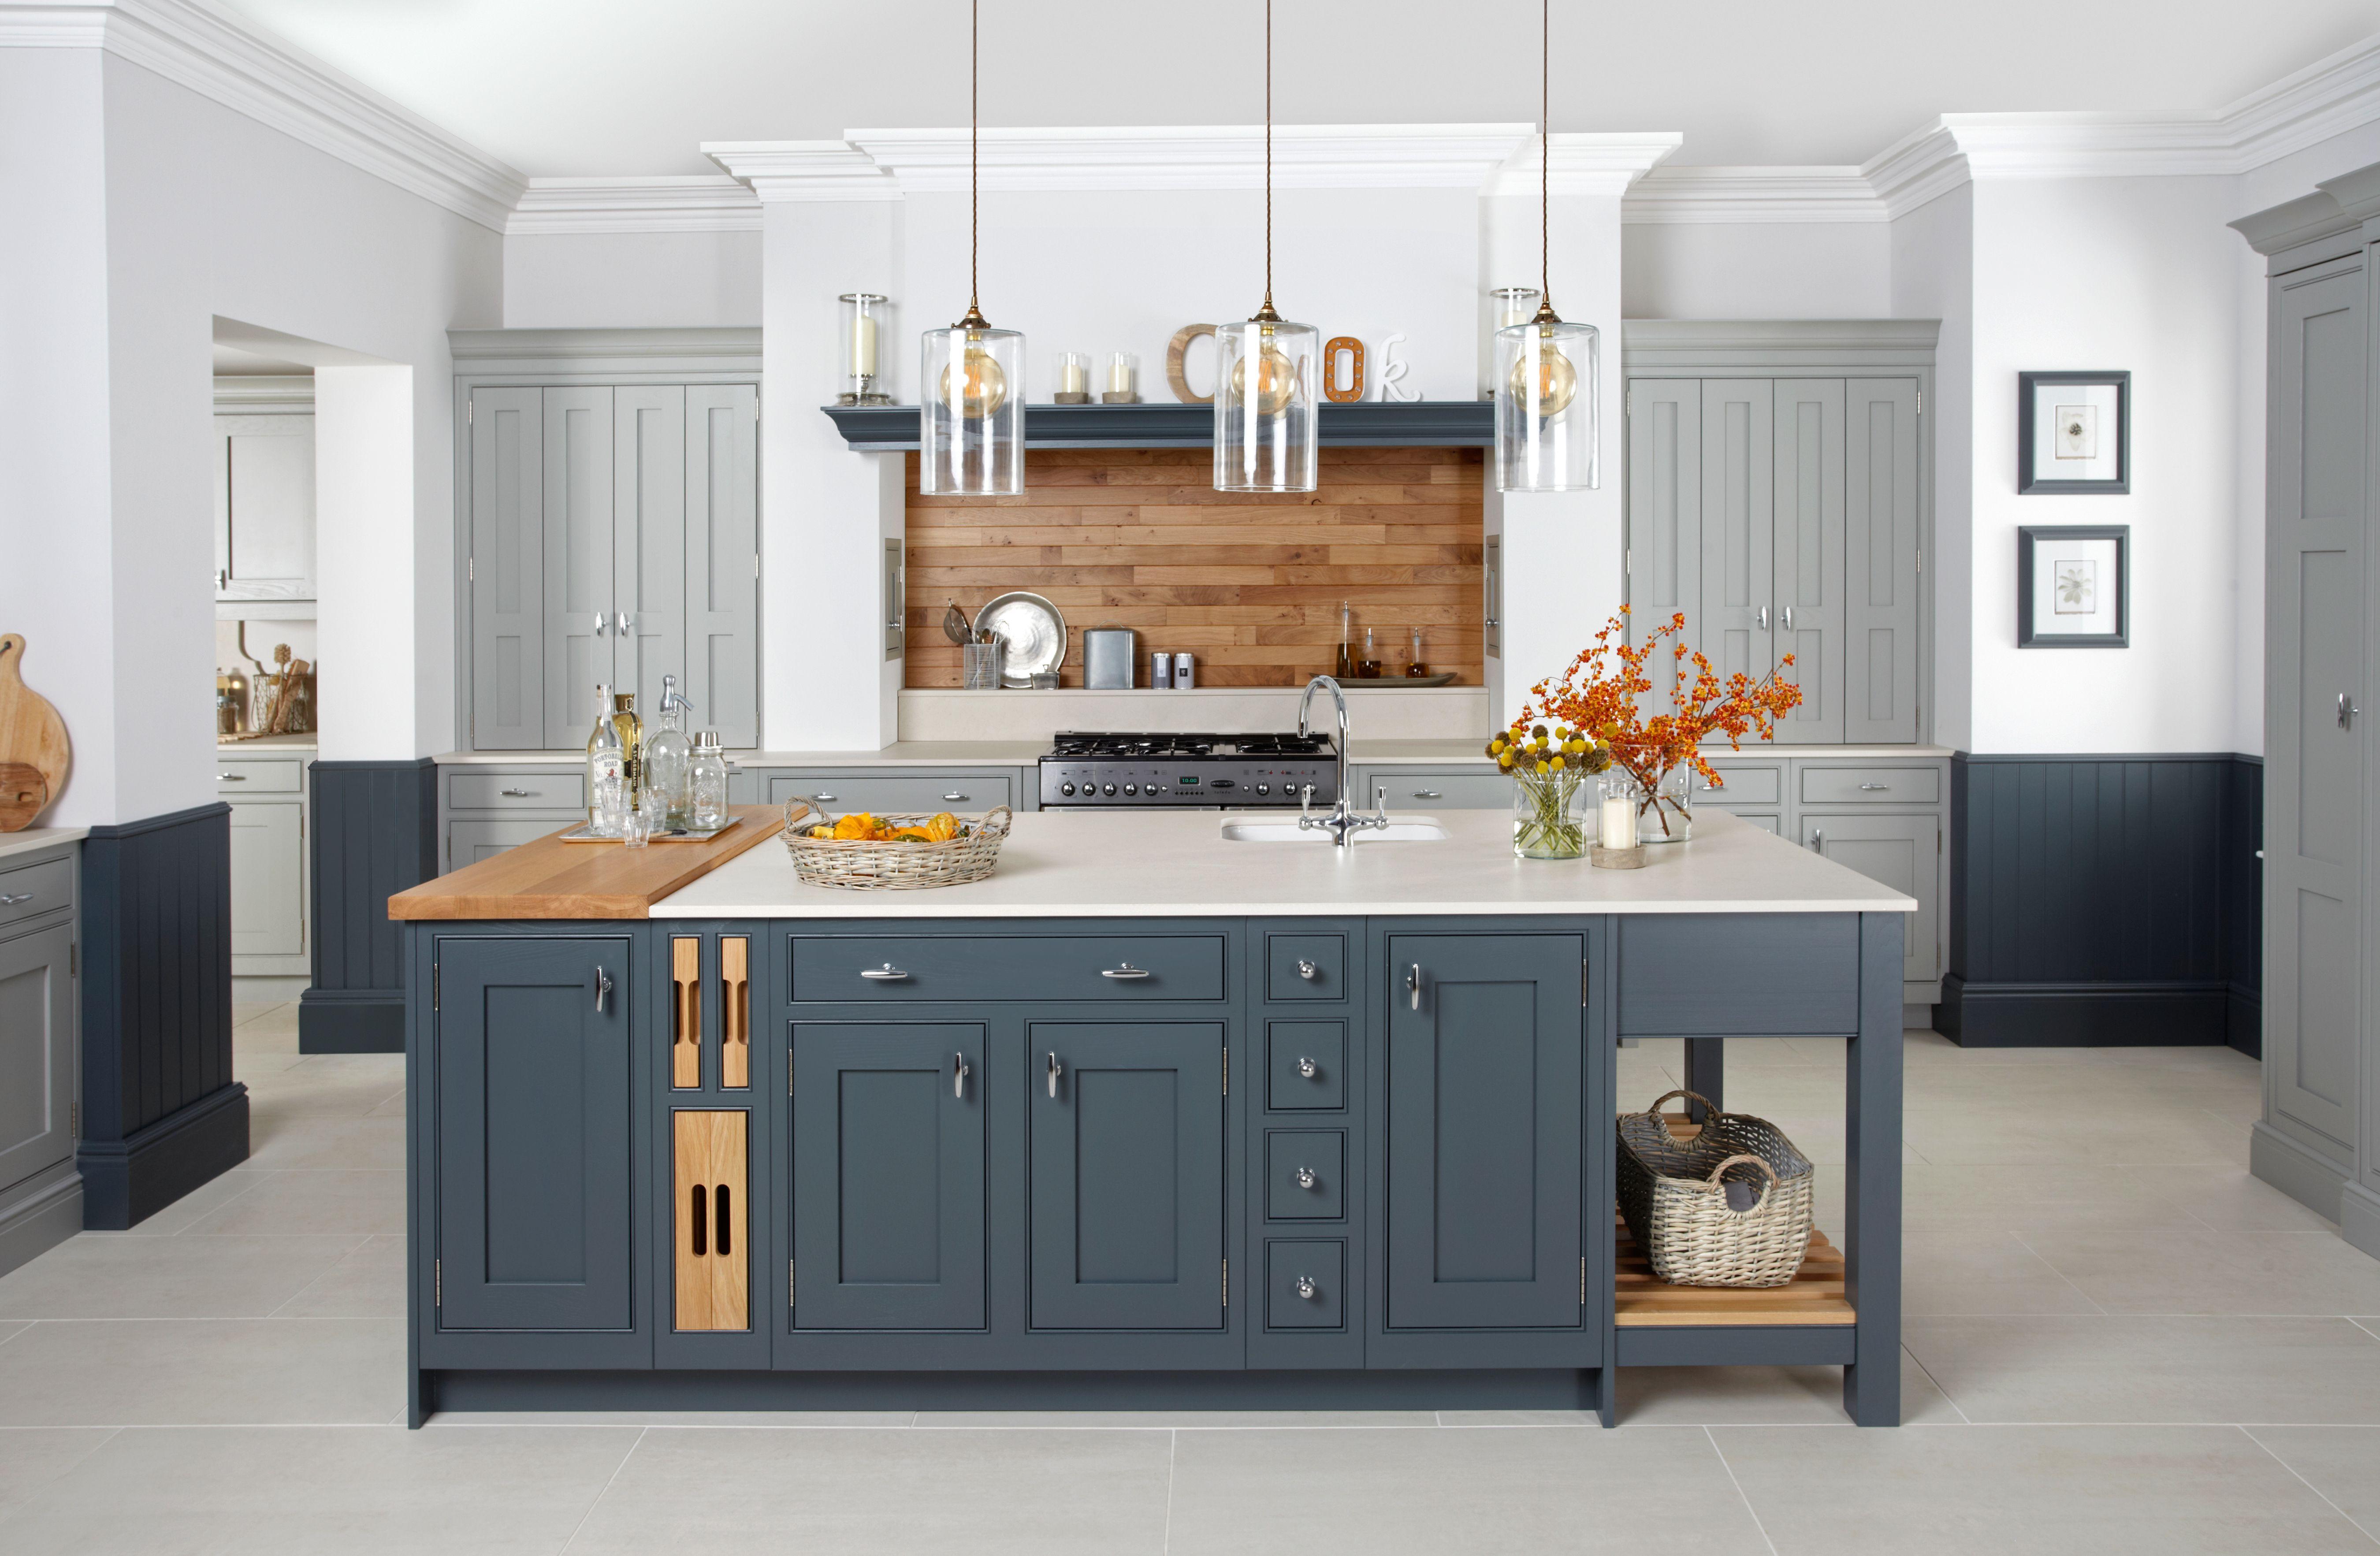 Burbidge's Langton Kitchen painted in Gravel and Seal Grey ...